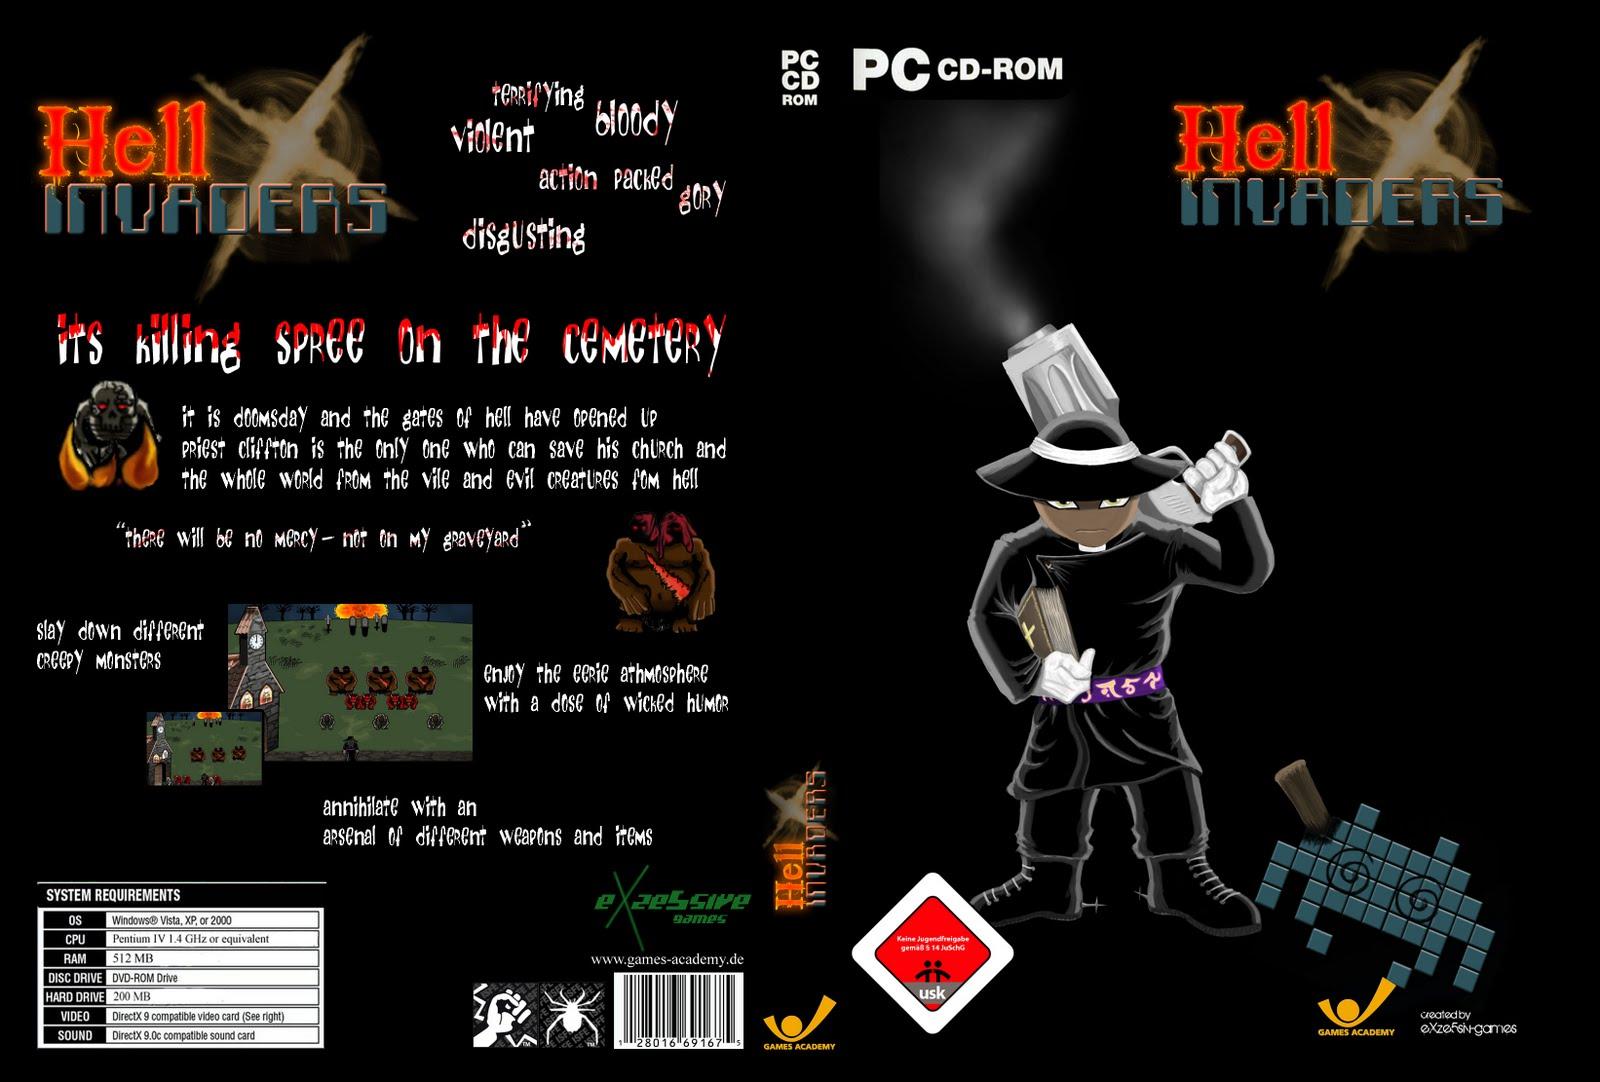 hellinvaders